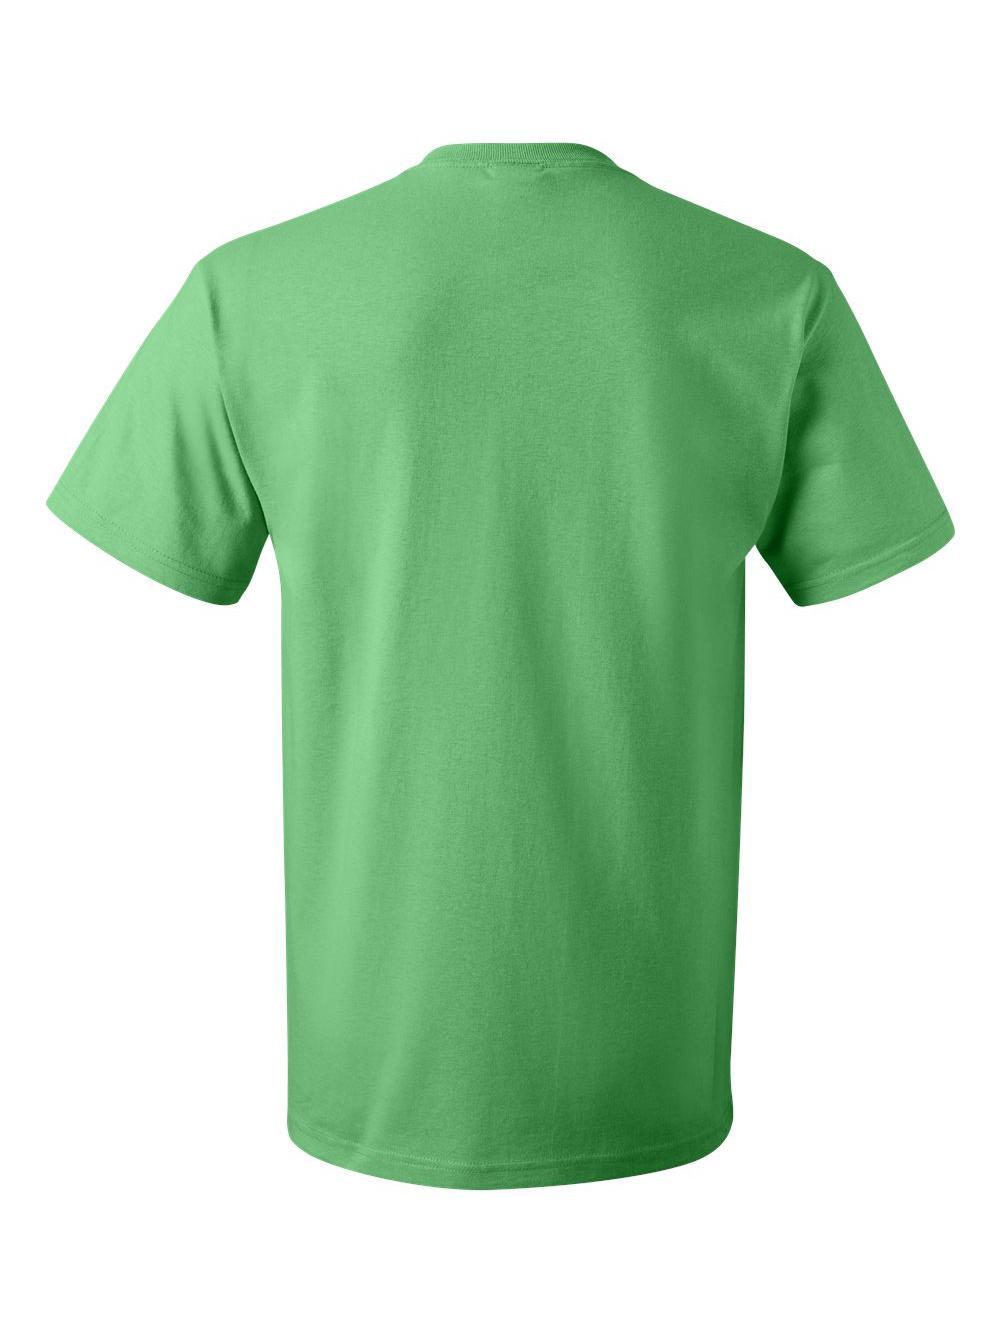 Fruit-of-the-Loom-HD-Cotton-Short-Sleeve-T-Shirt-3930R thumbnail 64